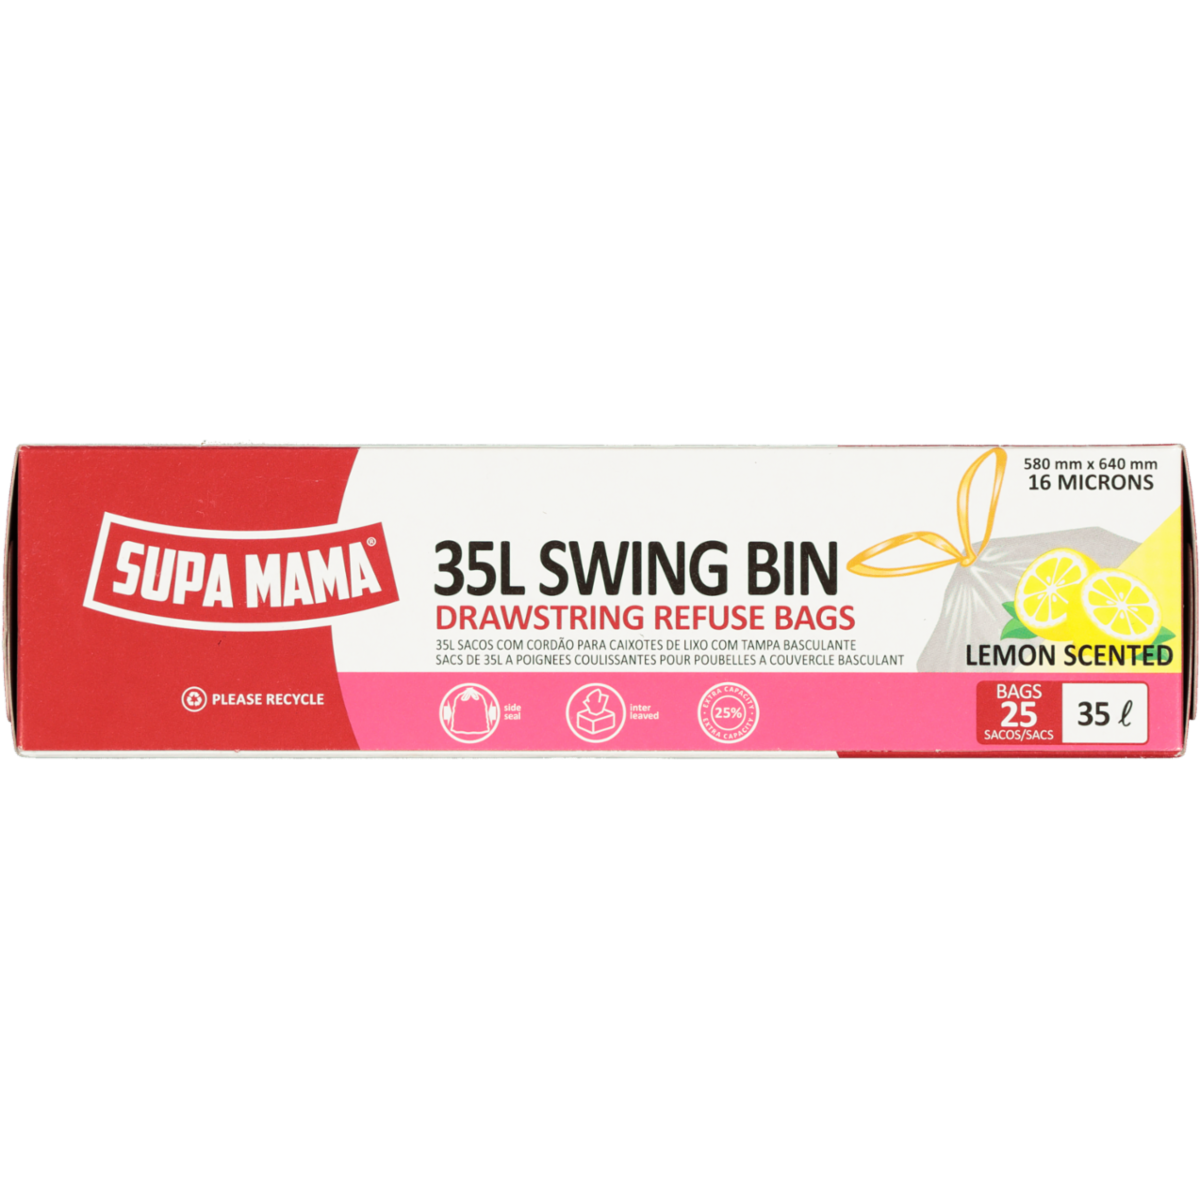 SUPA MAMA SWING BIN 35L-LEMON SCENTED